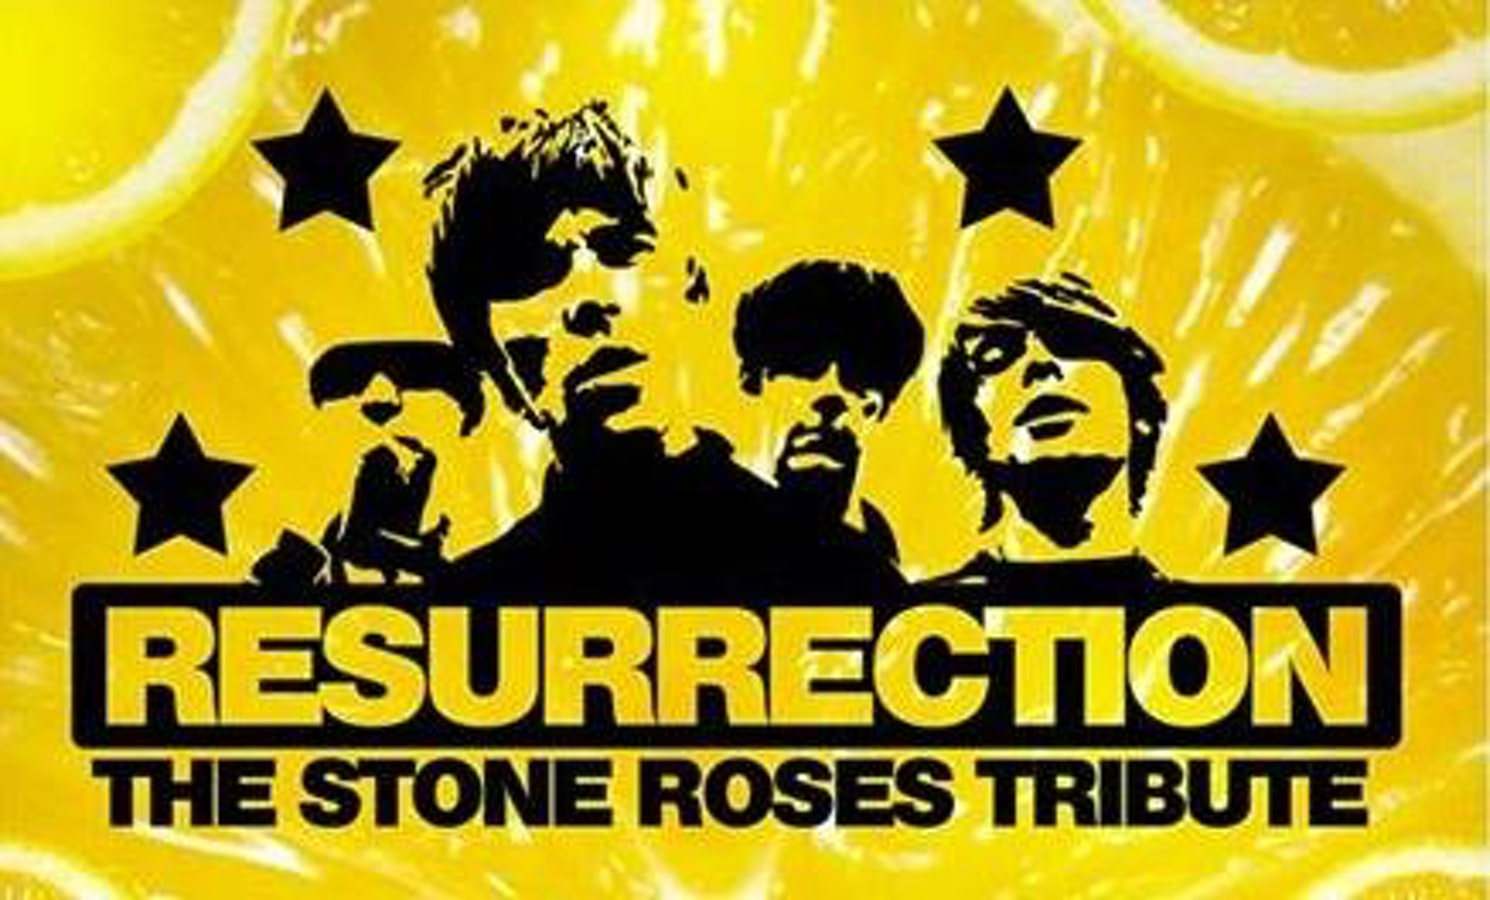 Resurrection Stone Roses at Sunbird Records